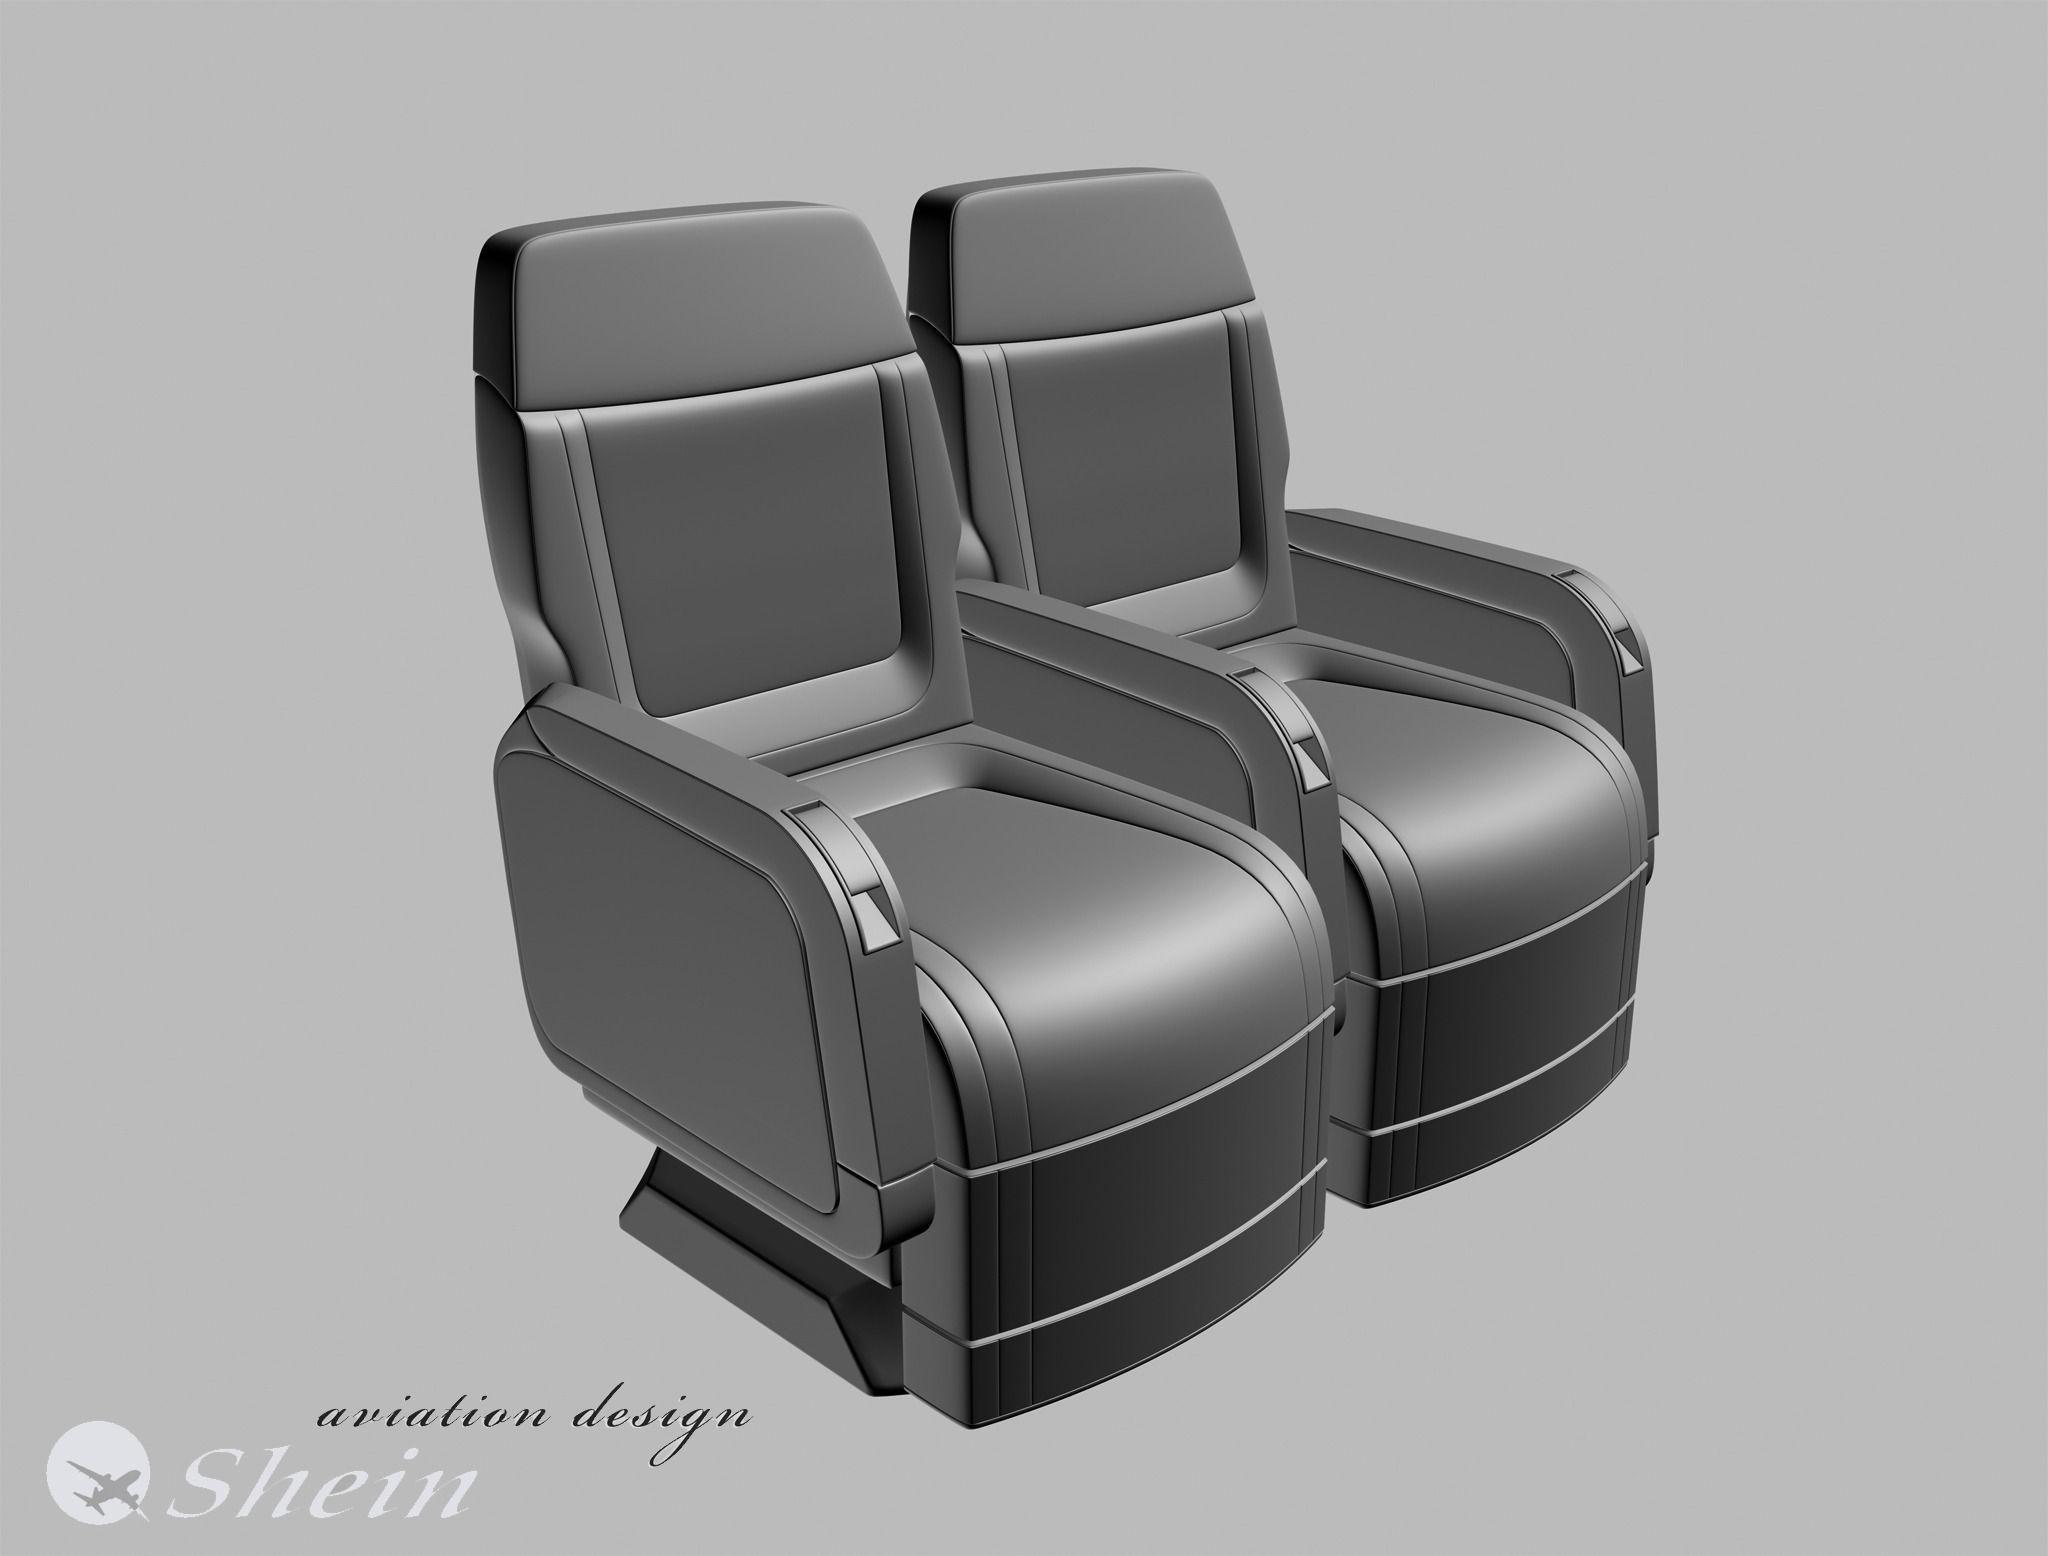 airplane seat of VIP class